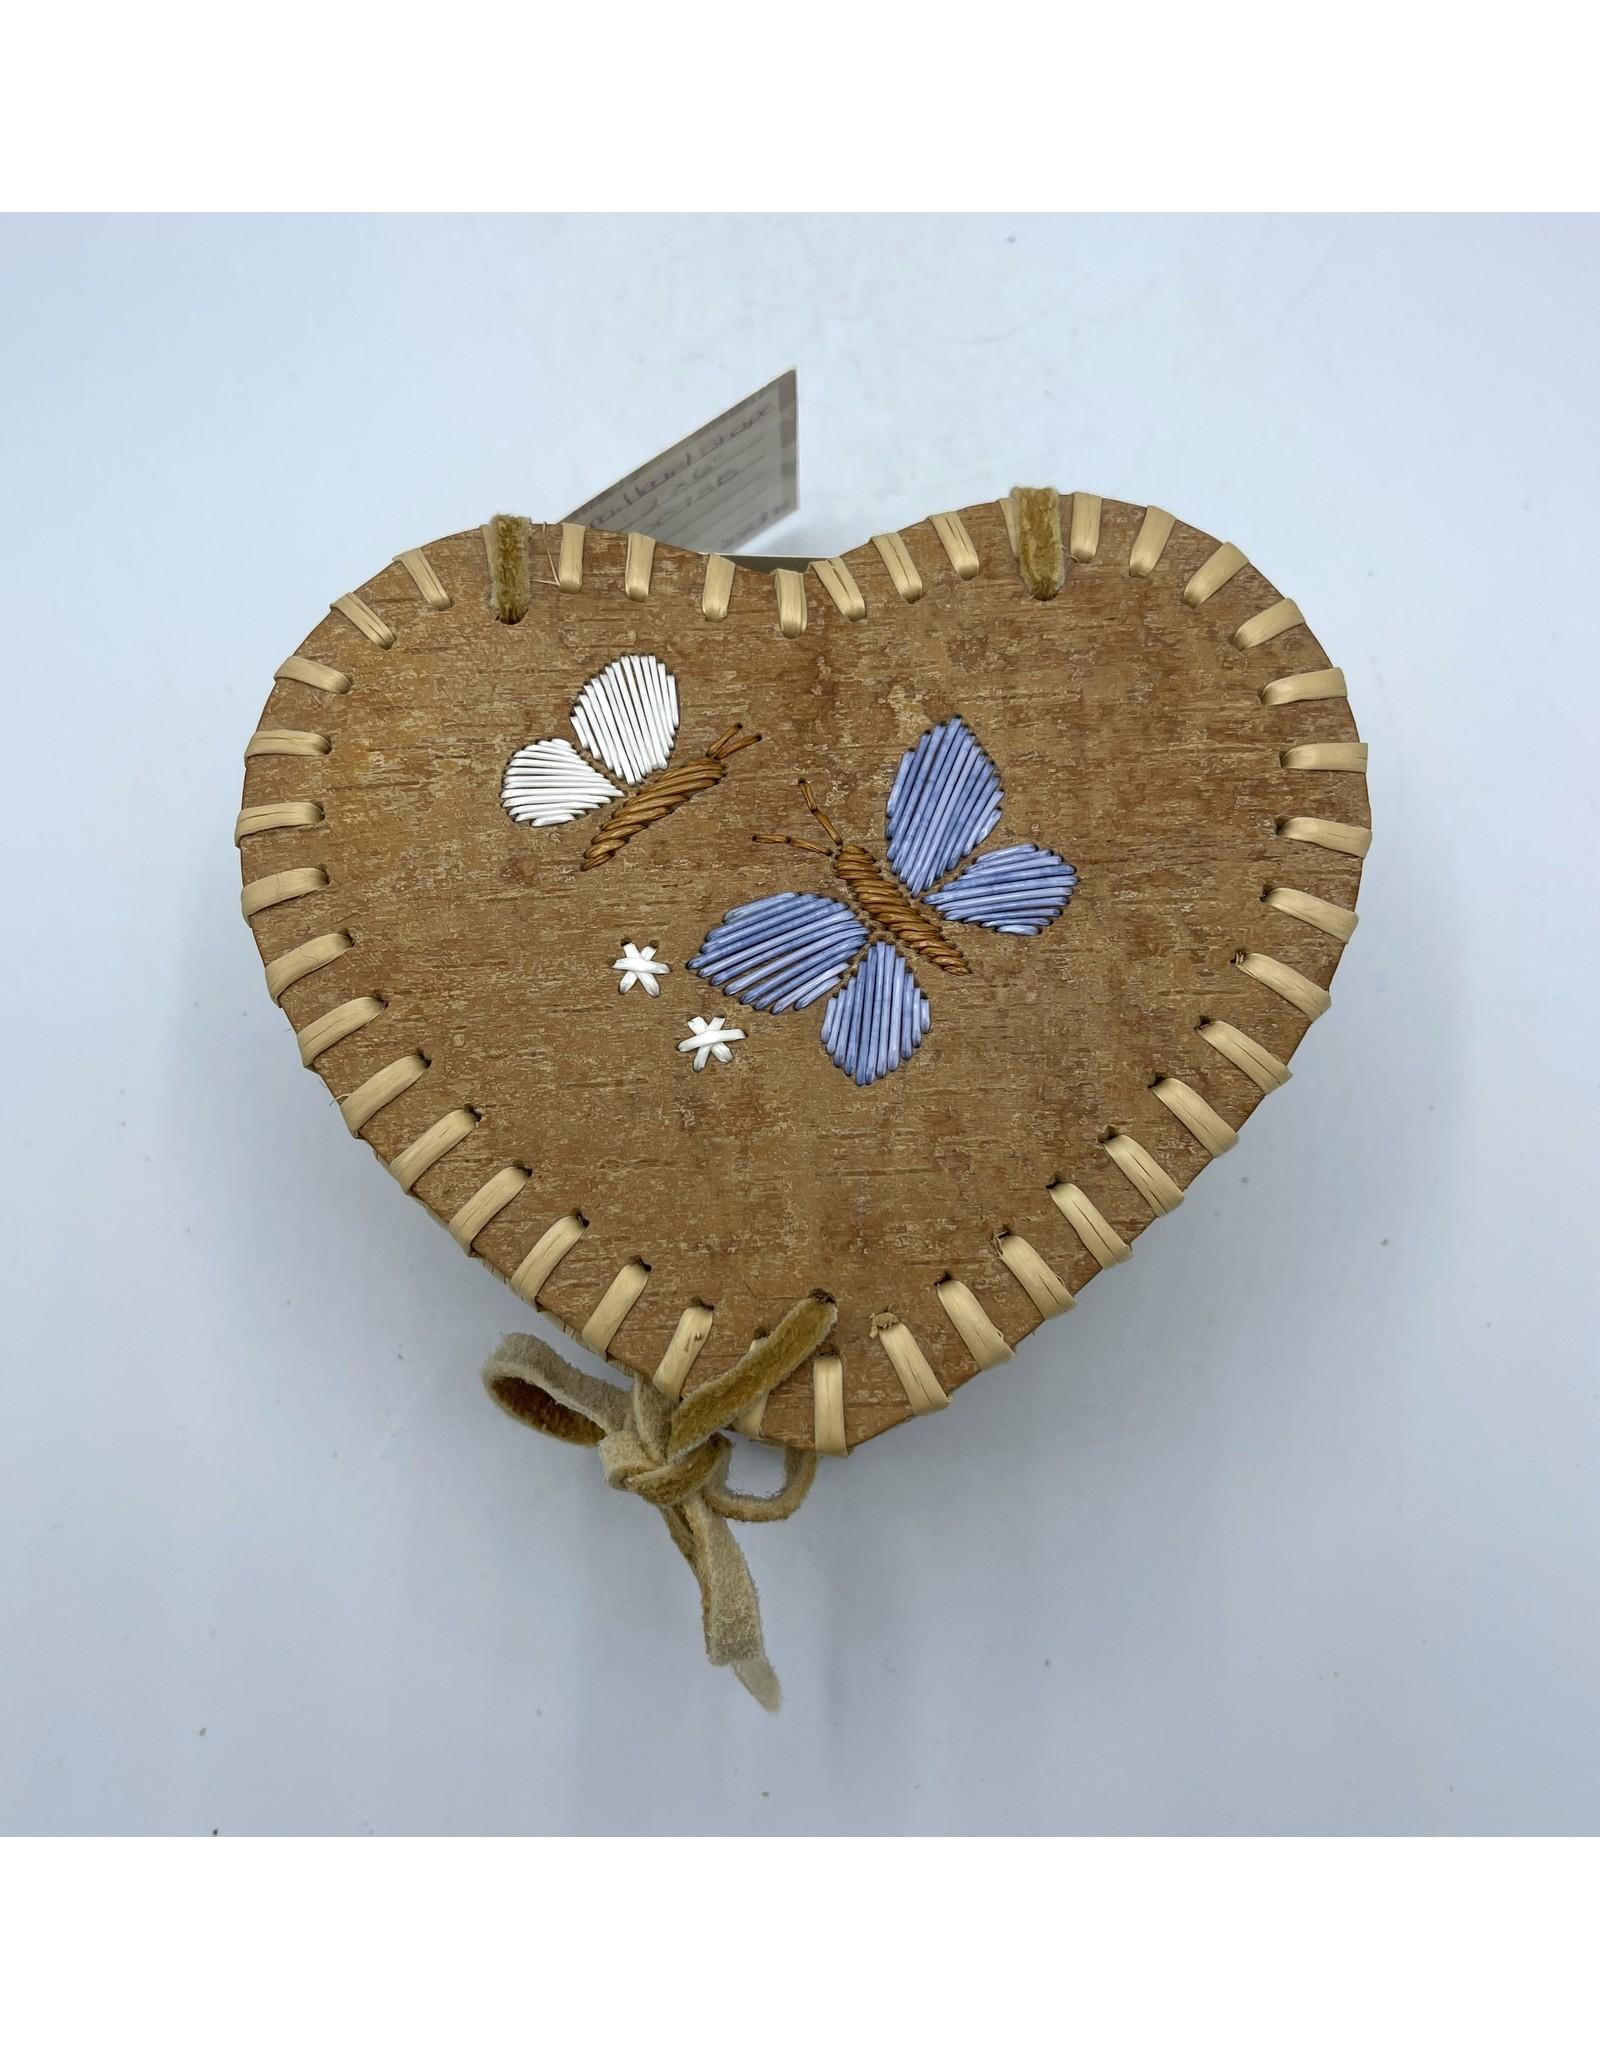 Medium Heart Birchbark Basket - 20072B